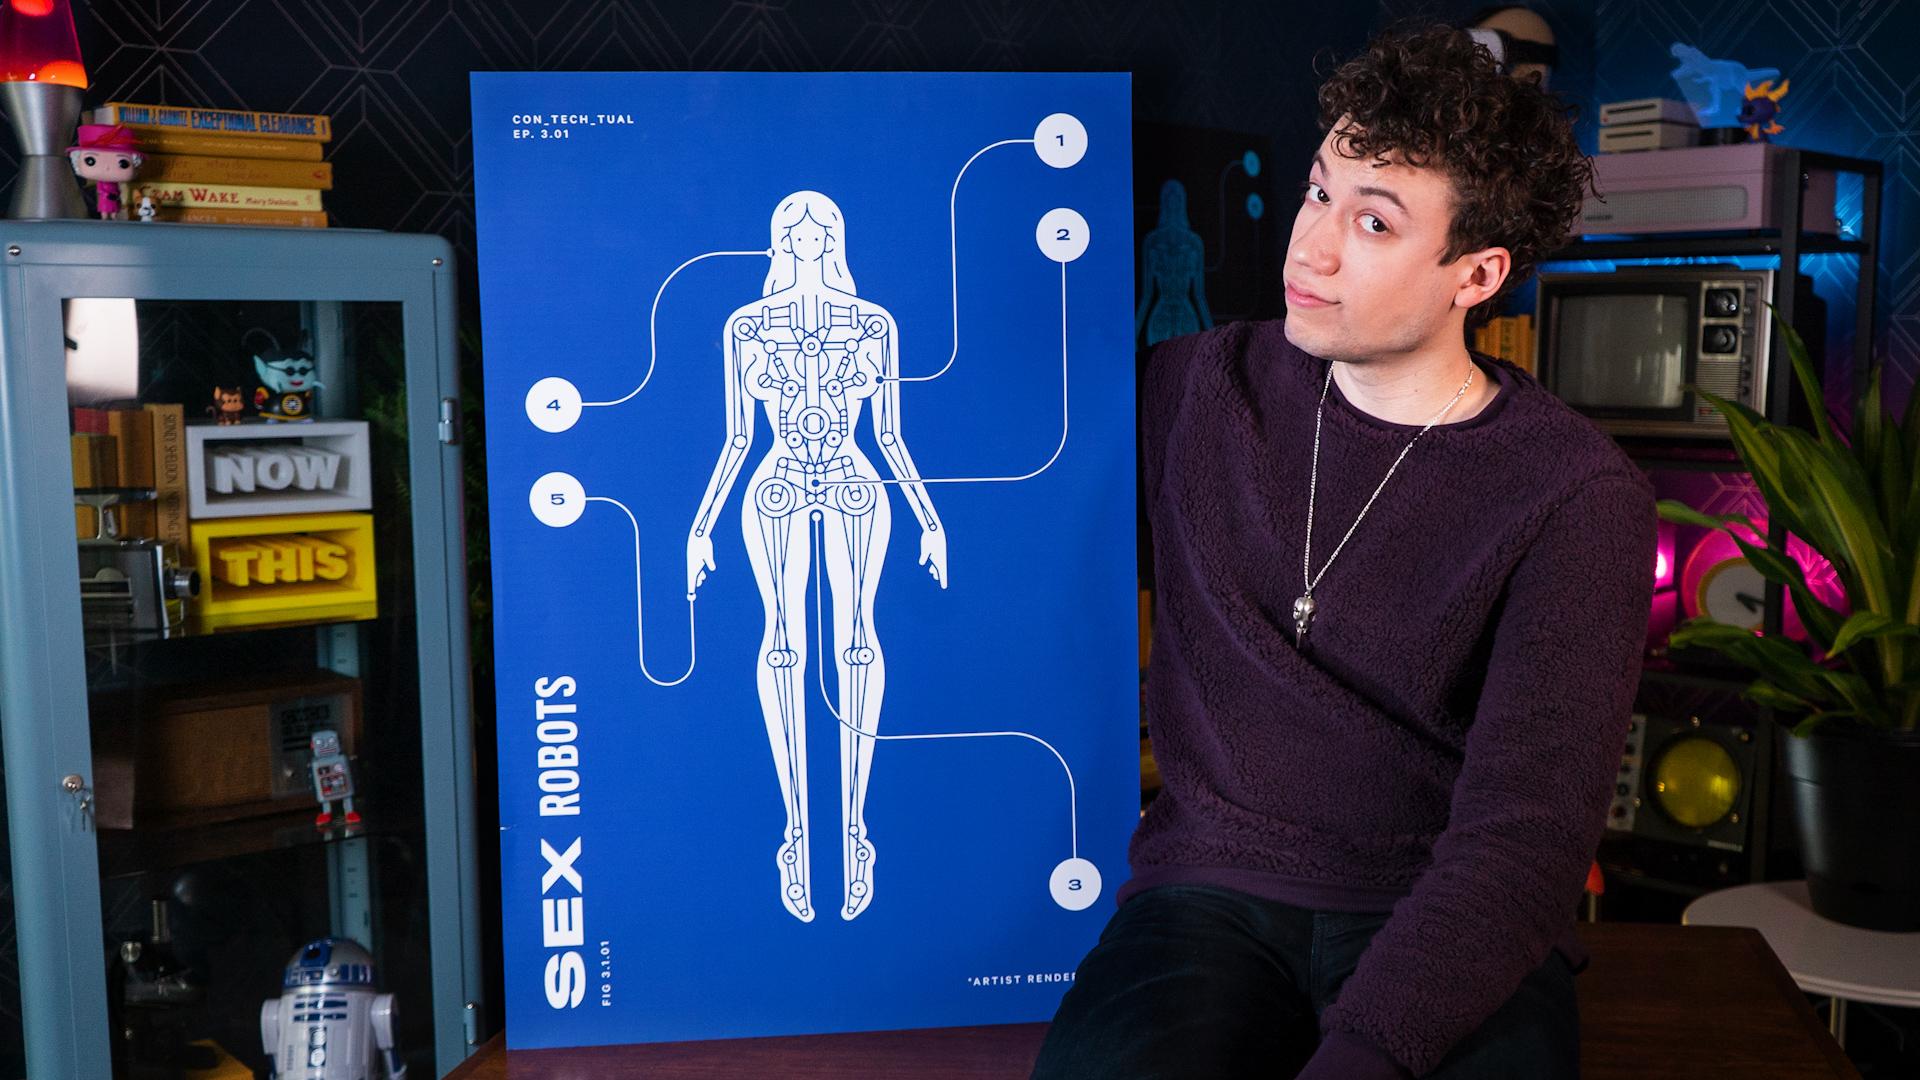 #SexRobotGripes Hashtag Arouses Twitter Backlash Against Robot-Human Love